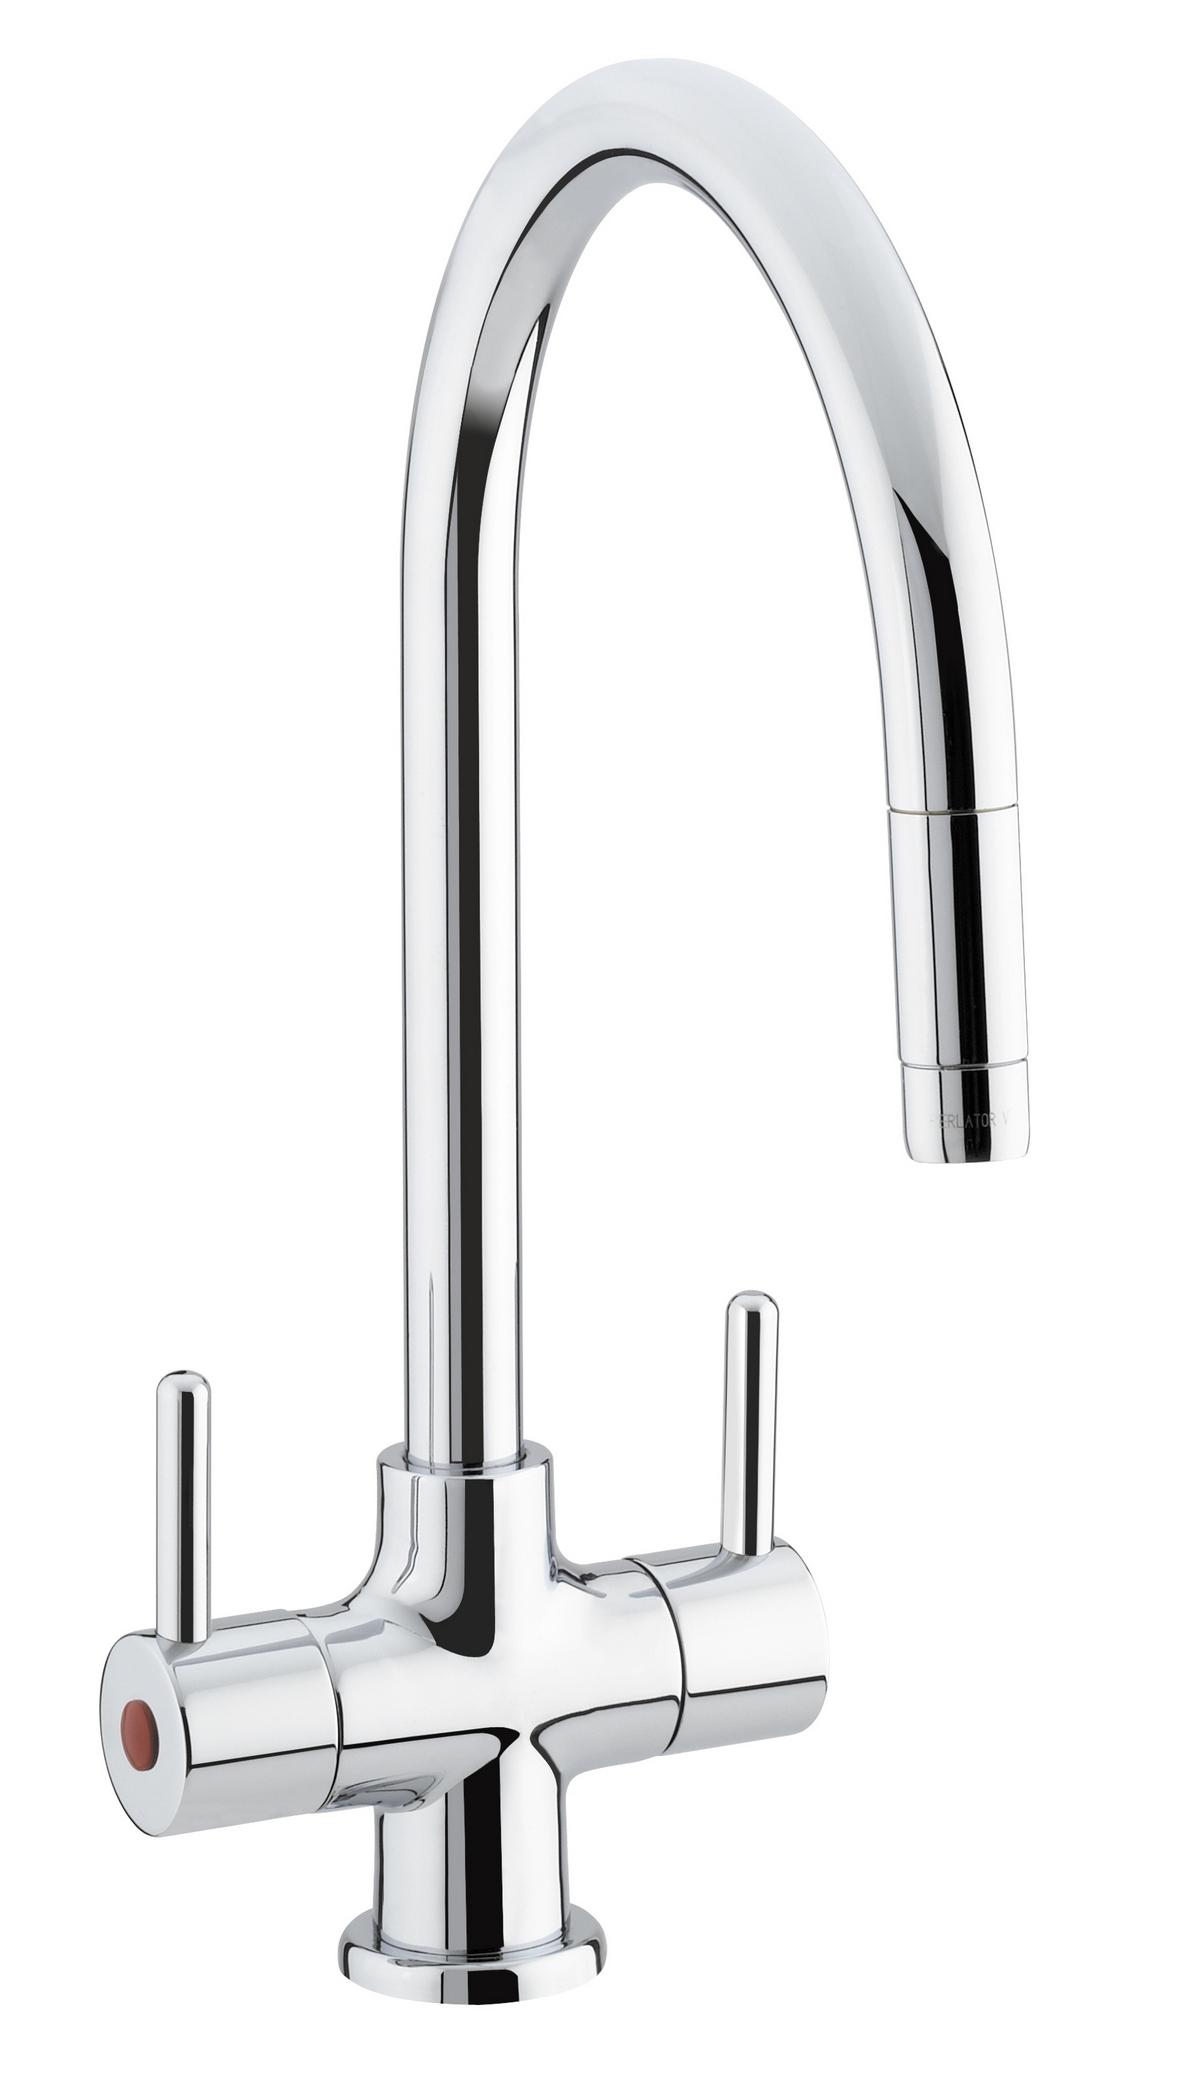 Bristan Beeline Mono Kitchen Sink Mixer Tap Pull Out Nozzle ...